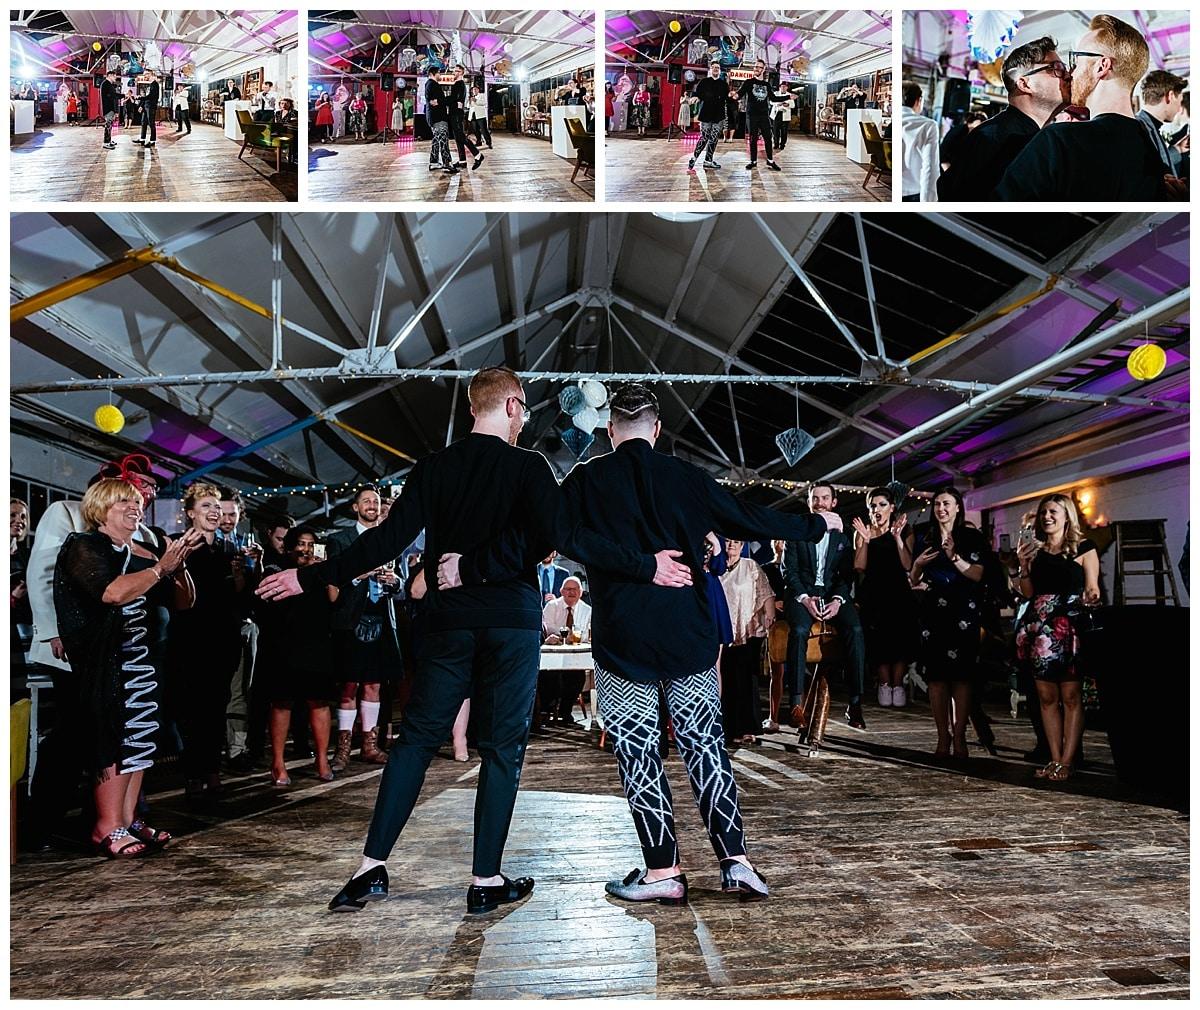 Michael James London Warehouse Hay Wedding 085-NIKON D810 14 mm 1-125 sec at f - 4.0 ISO 400 04 Mar 1855 (923)__Alternative Wedding Photographers London Gay Samesex Colourful.jpg